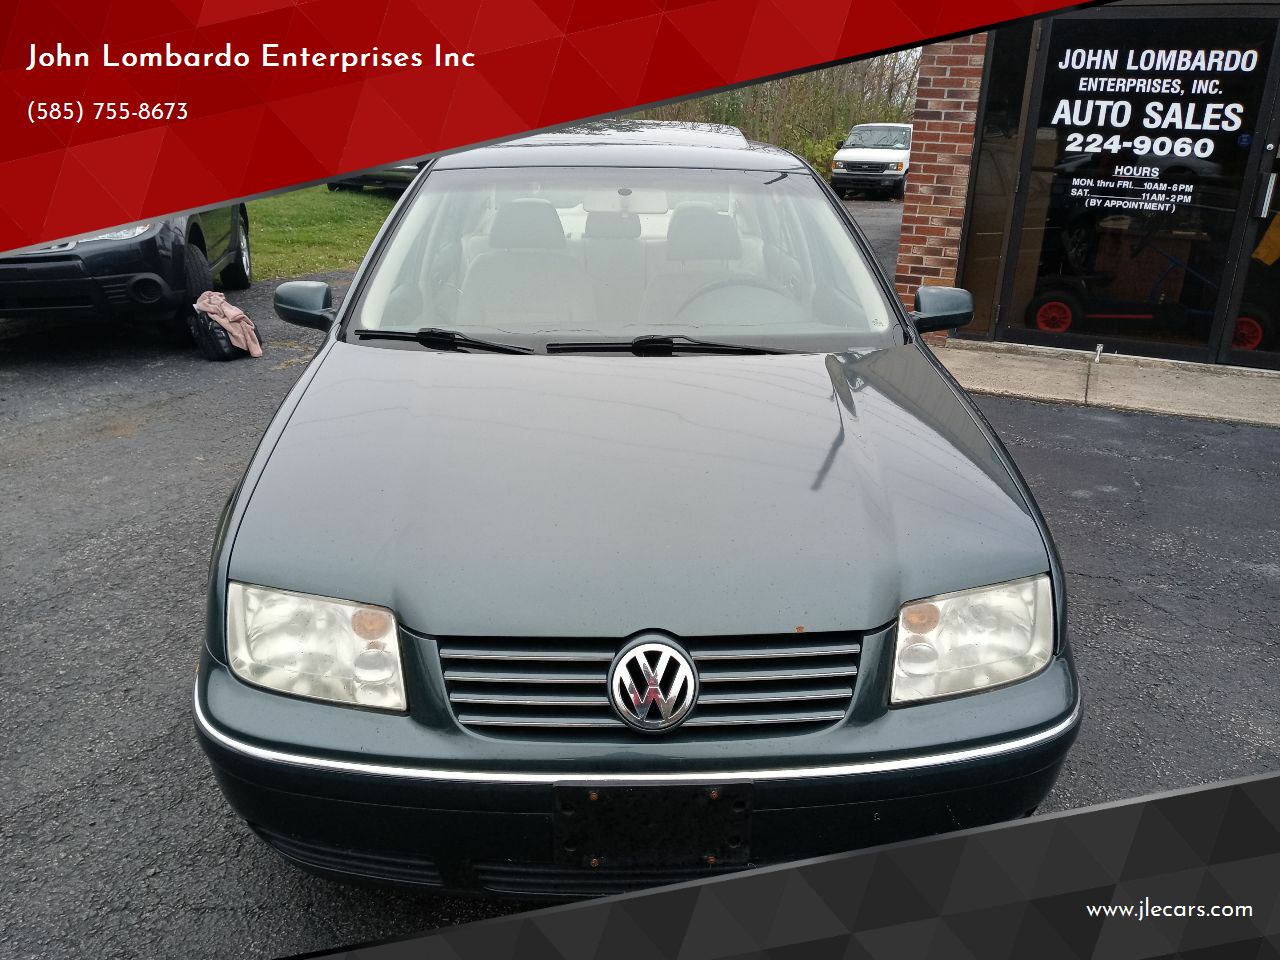 Used 2004 Volkswagen Jetta For Sale Carsforsale Com